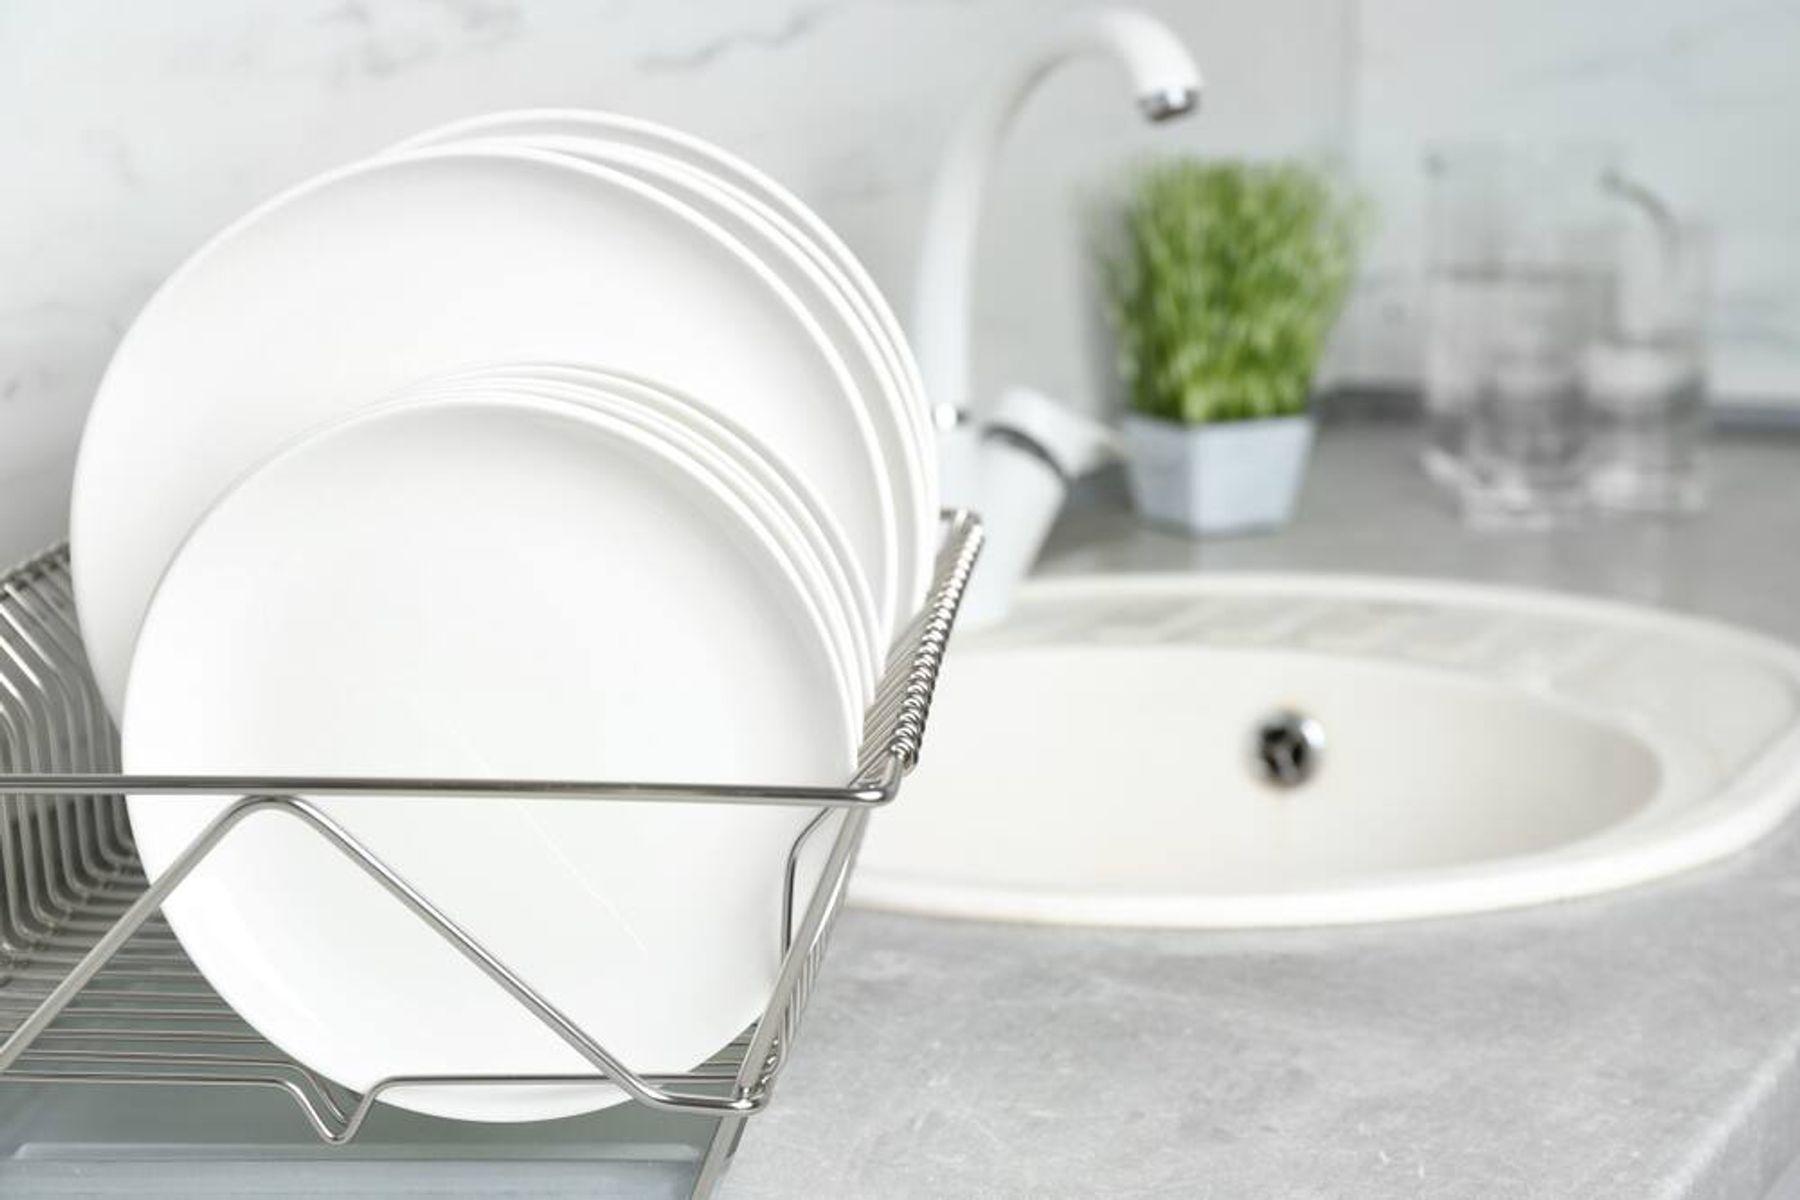 Cara membuat saringan air sederhana untuk wastafel